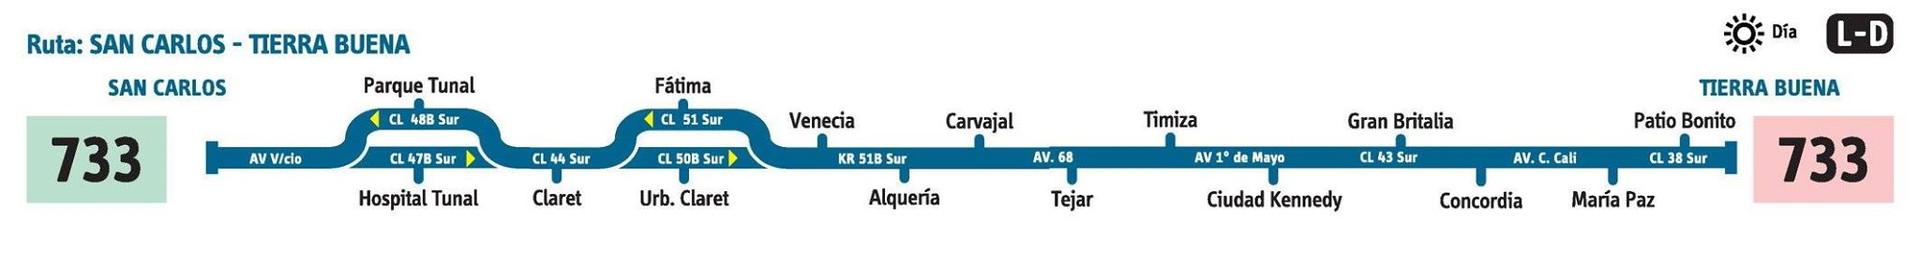 Ruta SITP: 733 Tierra Buena ↔ San Carlos (Venecia) [Urbana]